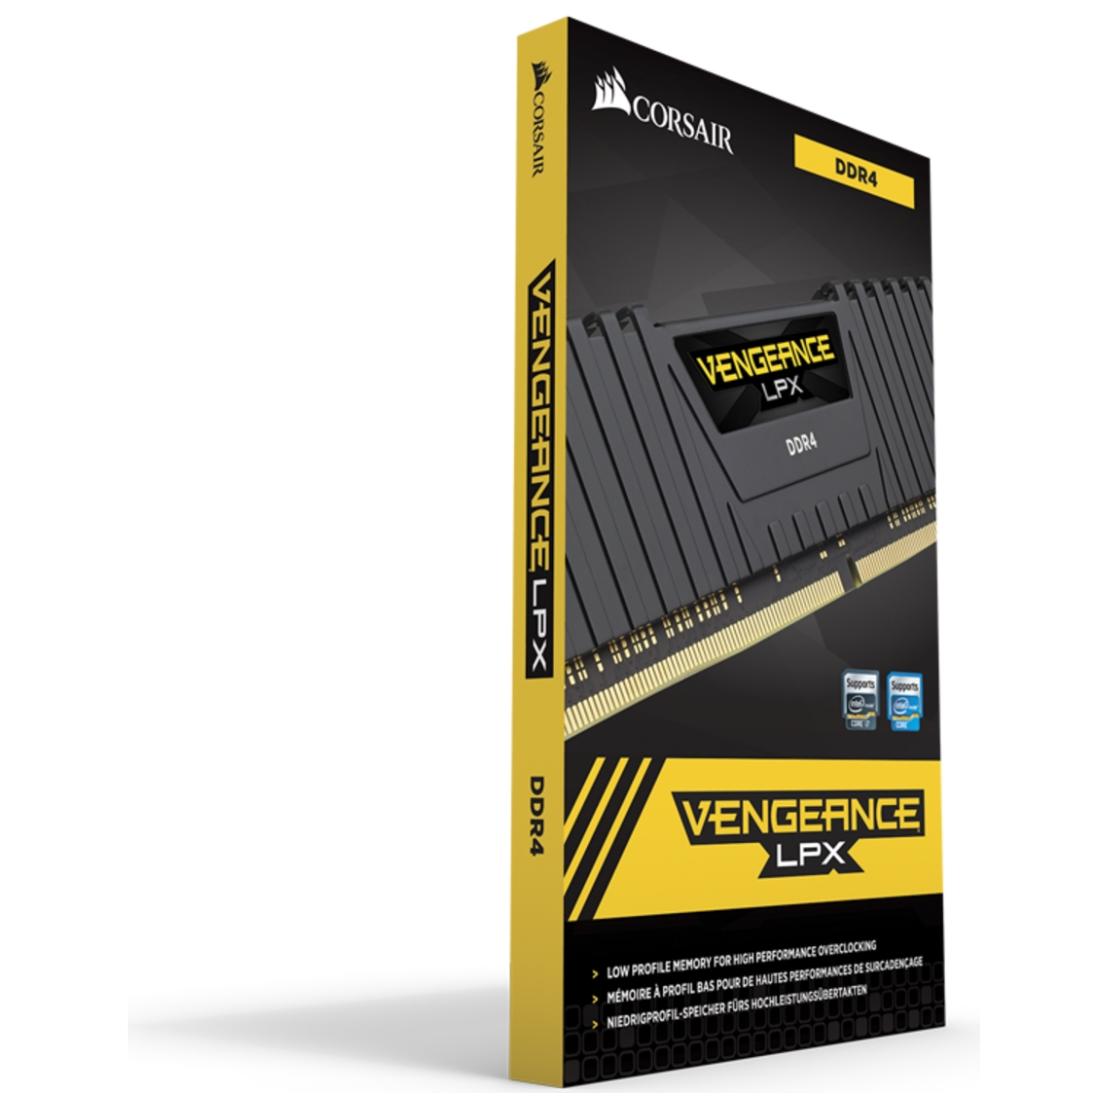 4 x 4GB CORSAIR VENGEANCE 16GB 2133 MHz DDR4 Desktop Memory